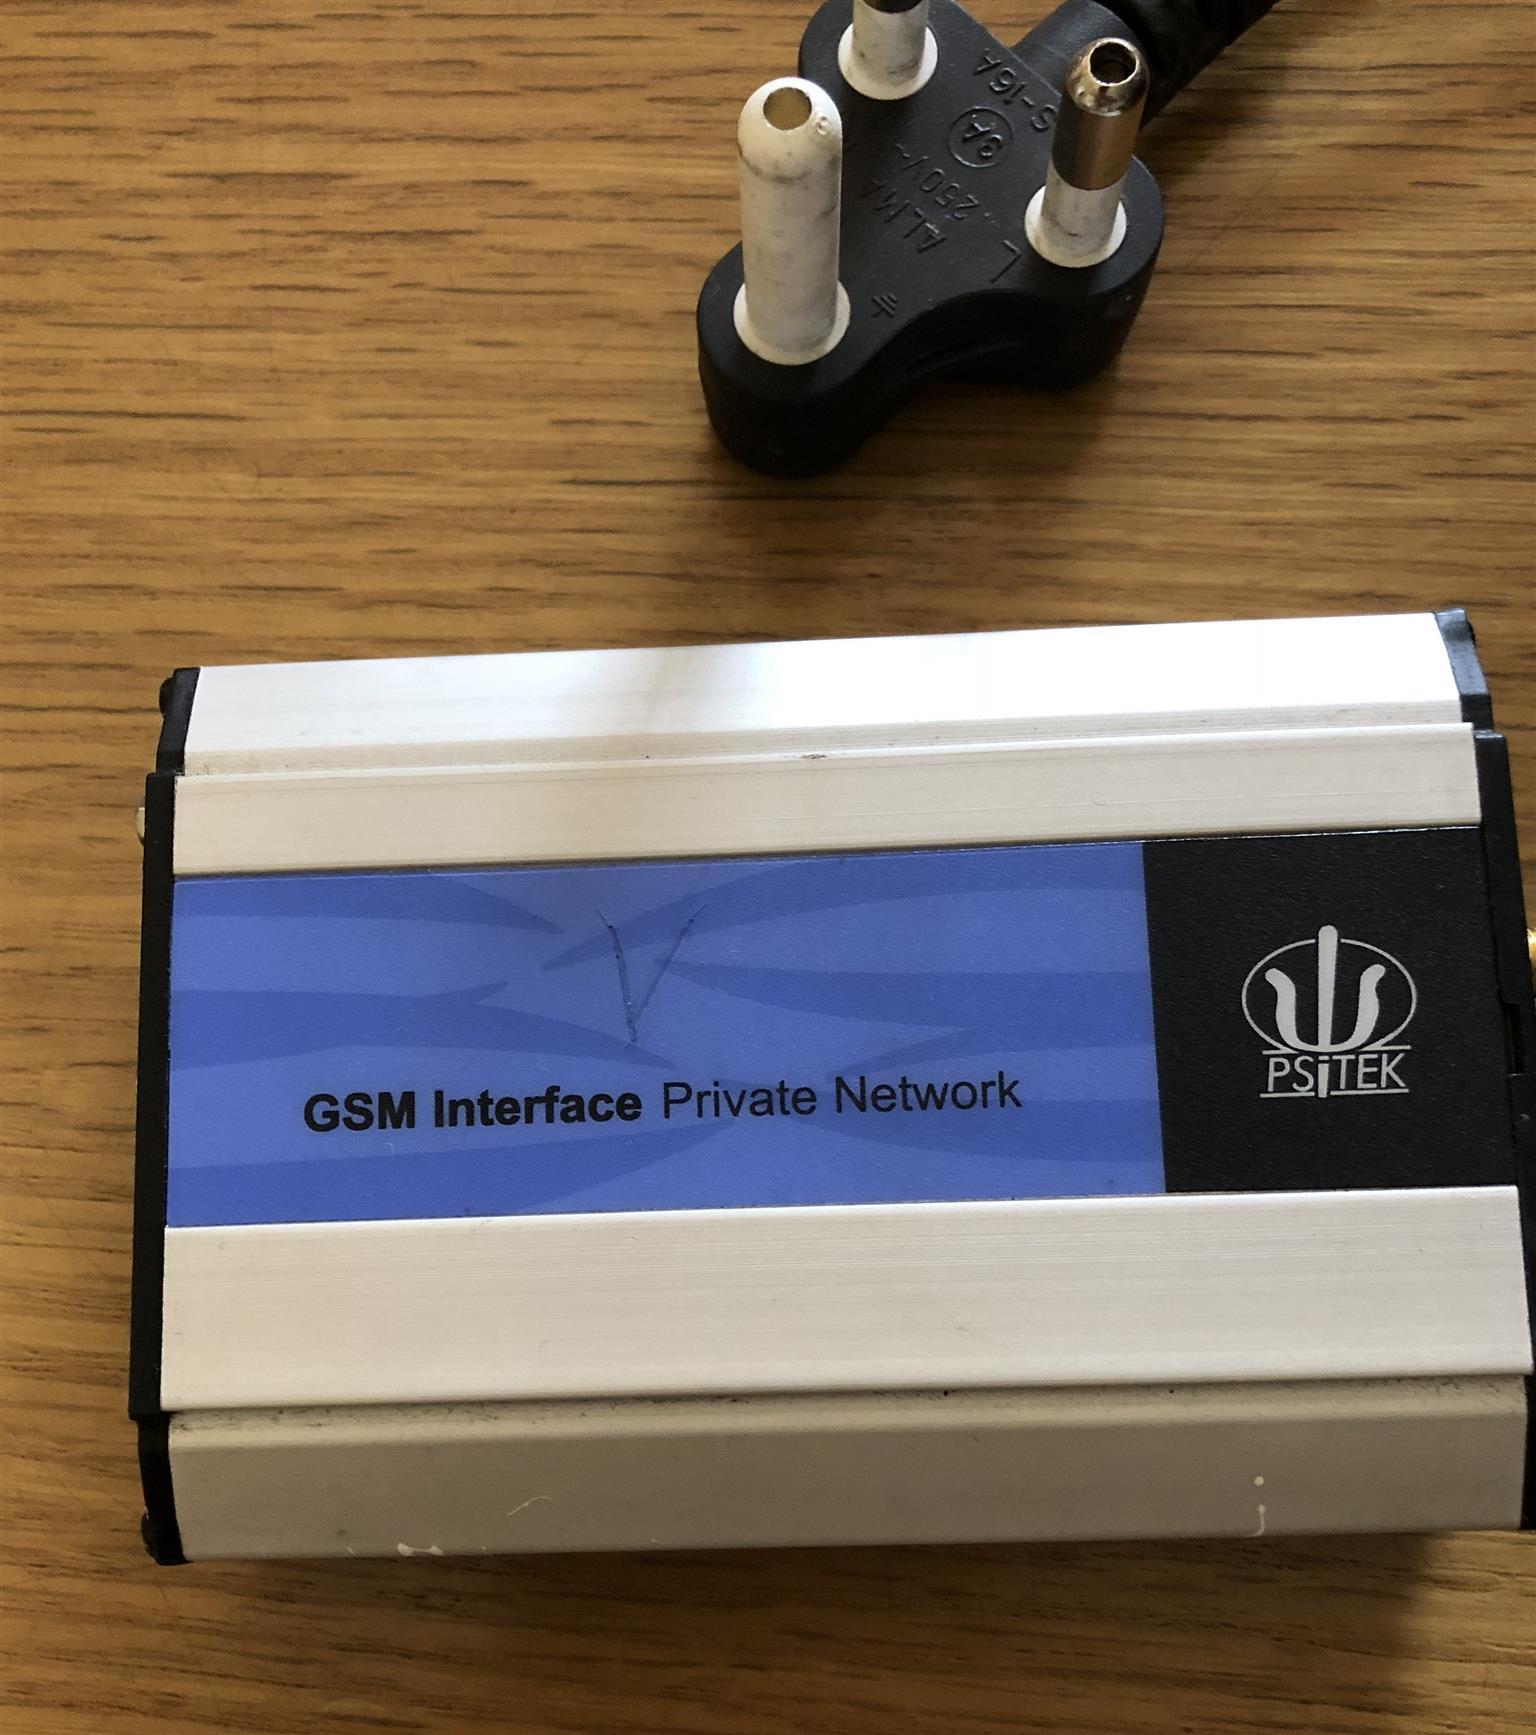 Psitek GSM Interface Private Network